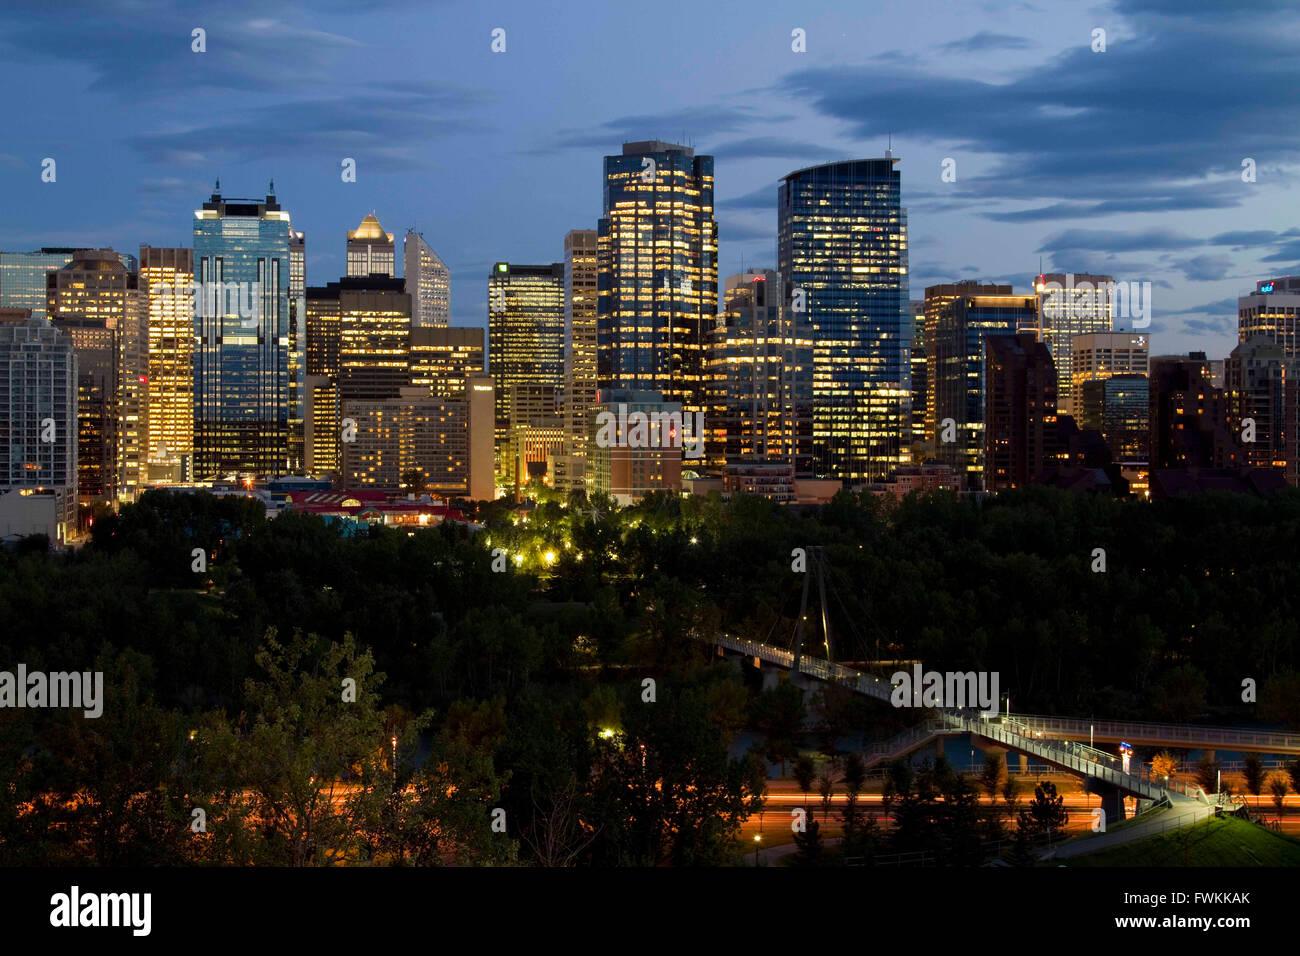 Die Innenstadt von Calgary Stockbild